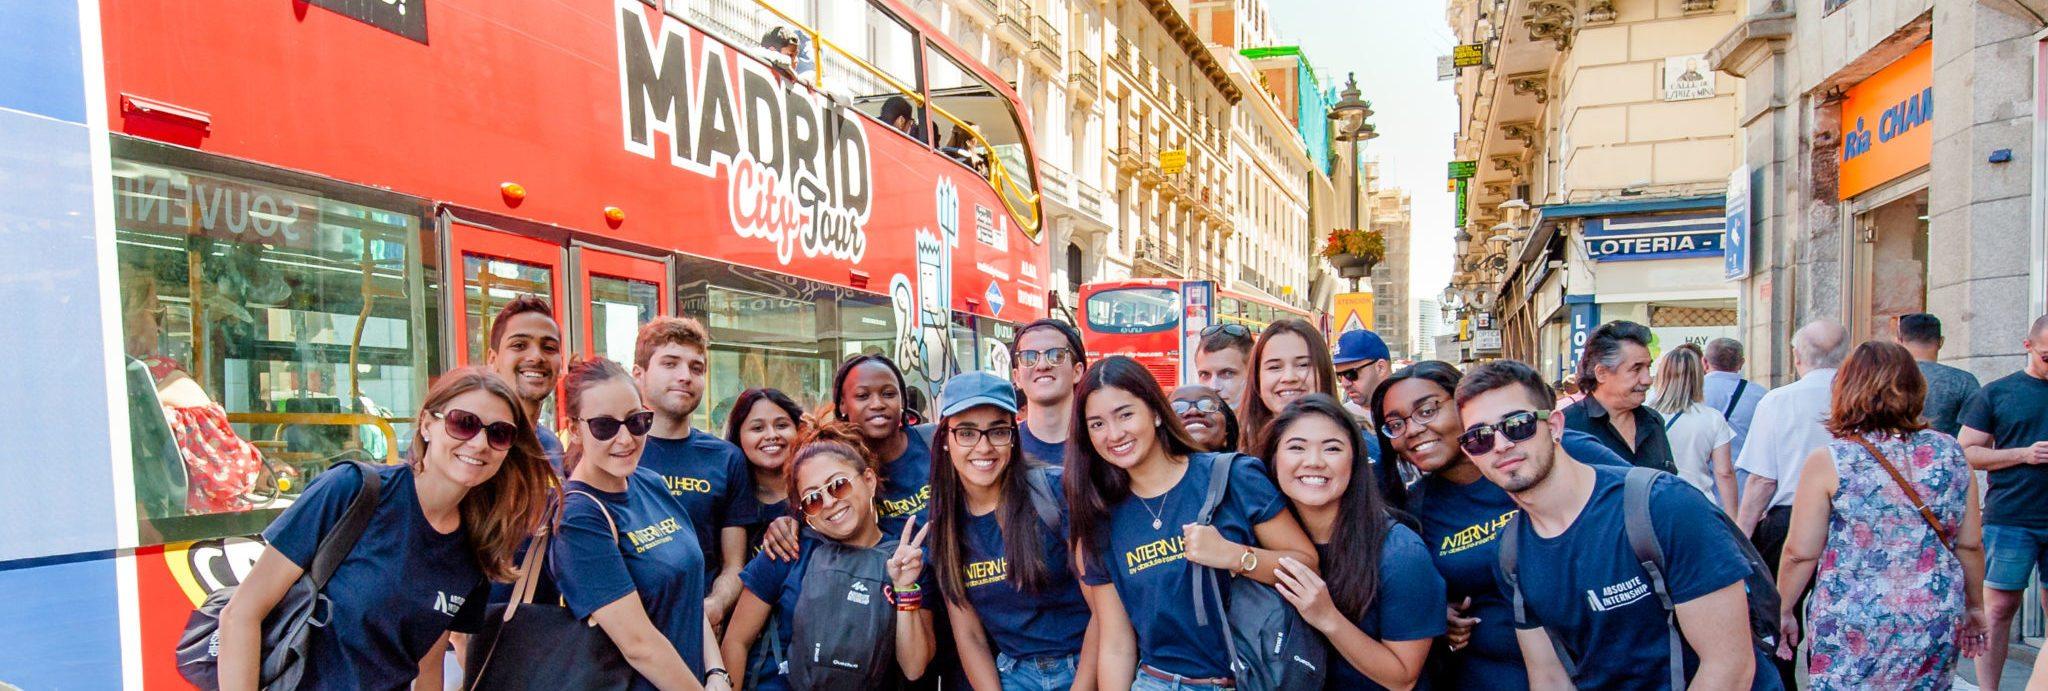 15 Best Internships In Spain For International Student 2019